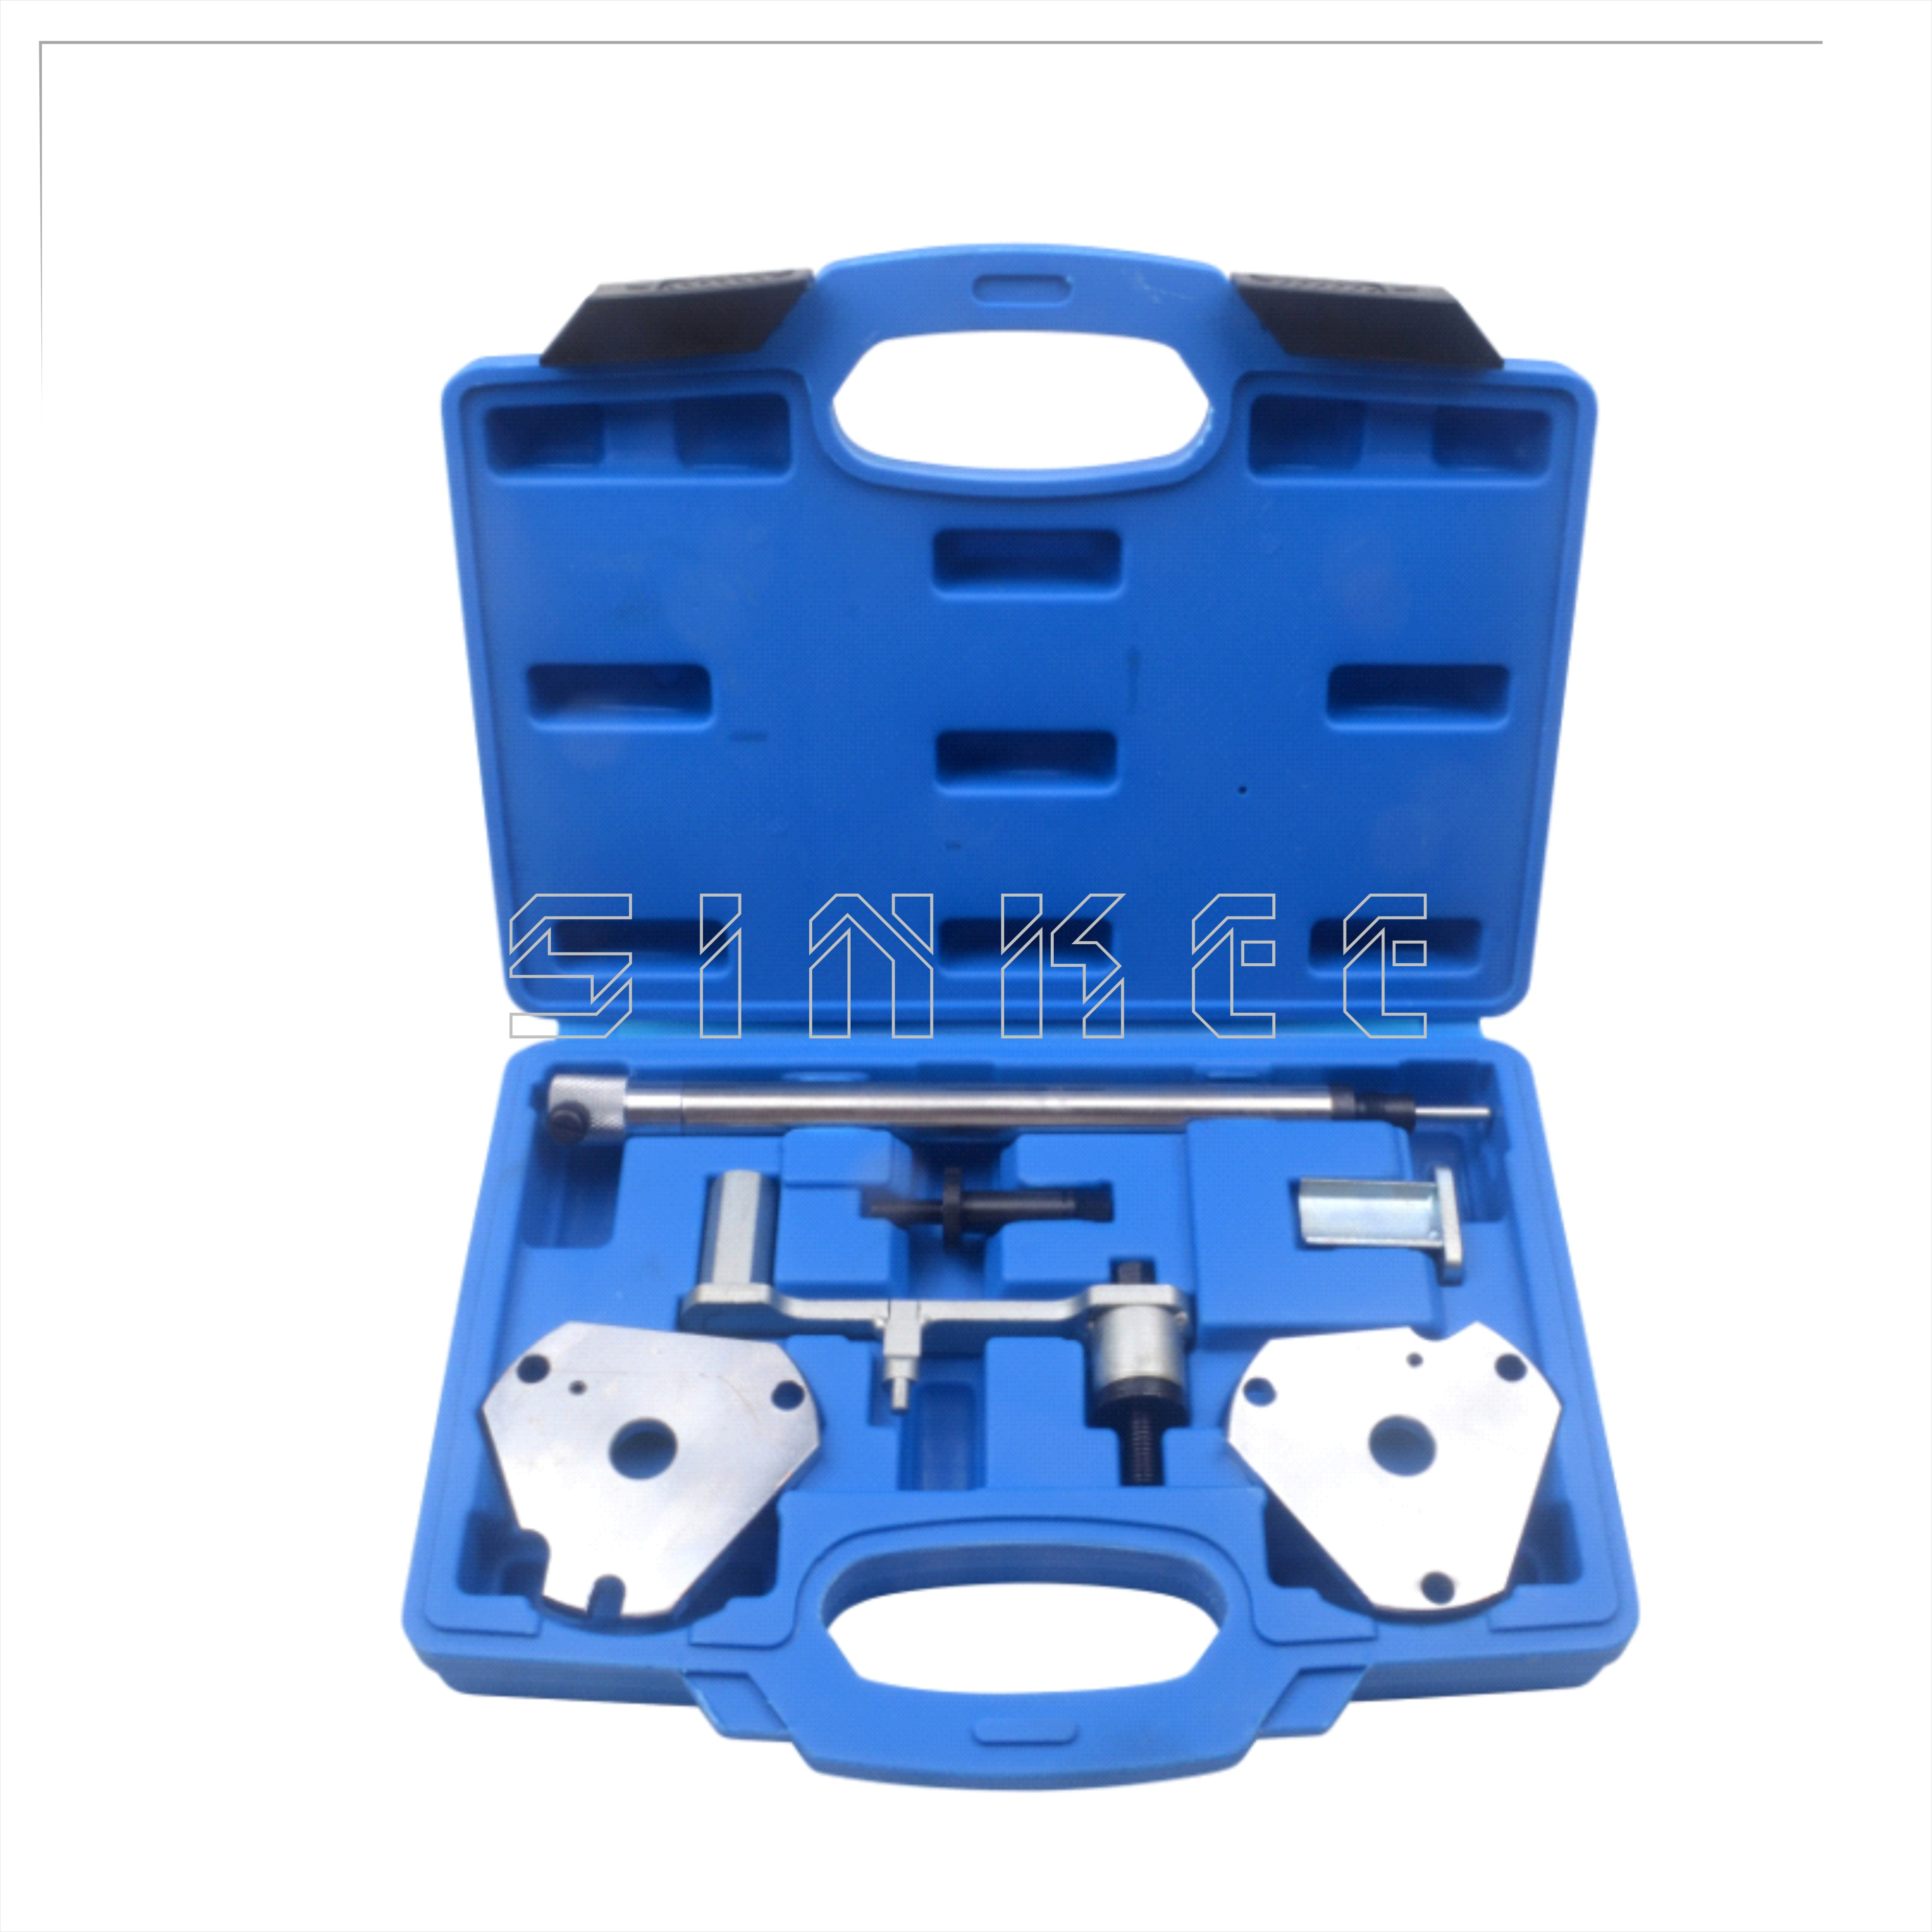 Petrol Engine Twin Cam Camshaft Timing Setting Lock Tool Set For Fiat 1.6 16v petrol engine timing setting locking tool kit set for alfa romeo twin cam twin spark 1 4 1 6 1 8 2 0 16v 145 146 155 156 sk1113